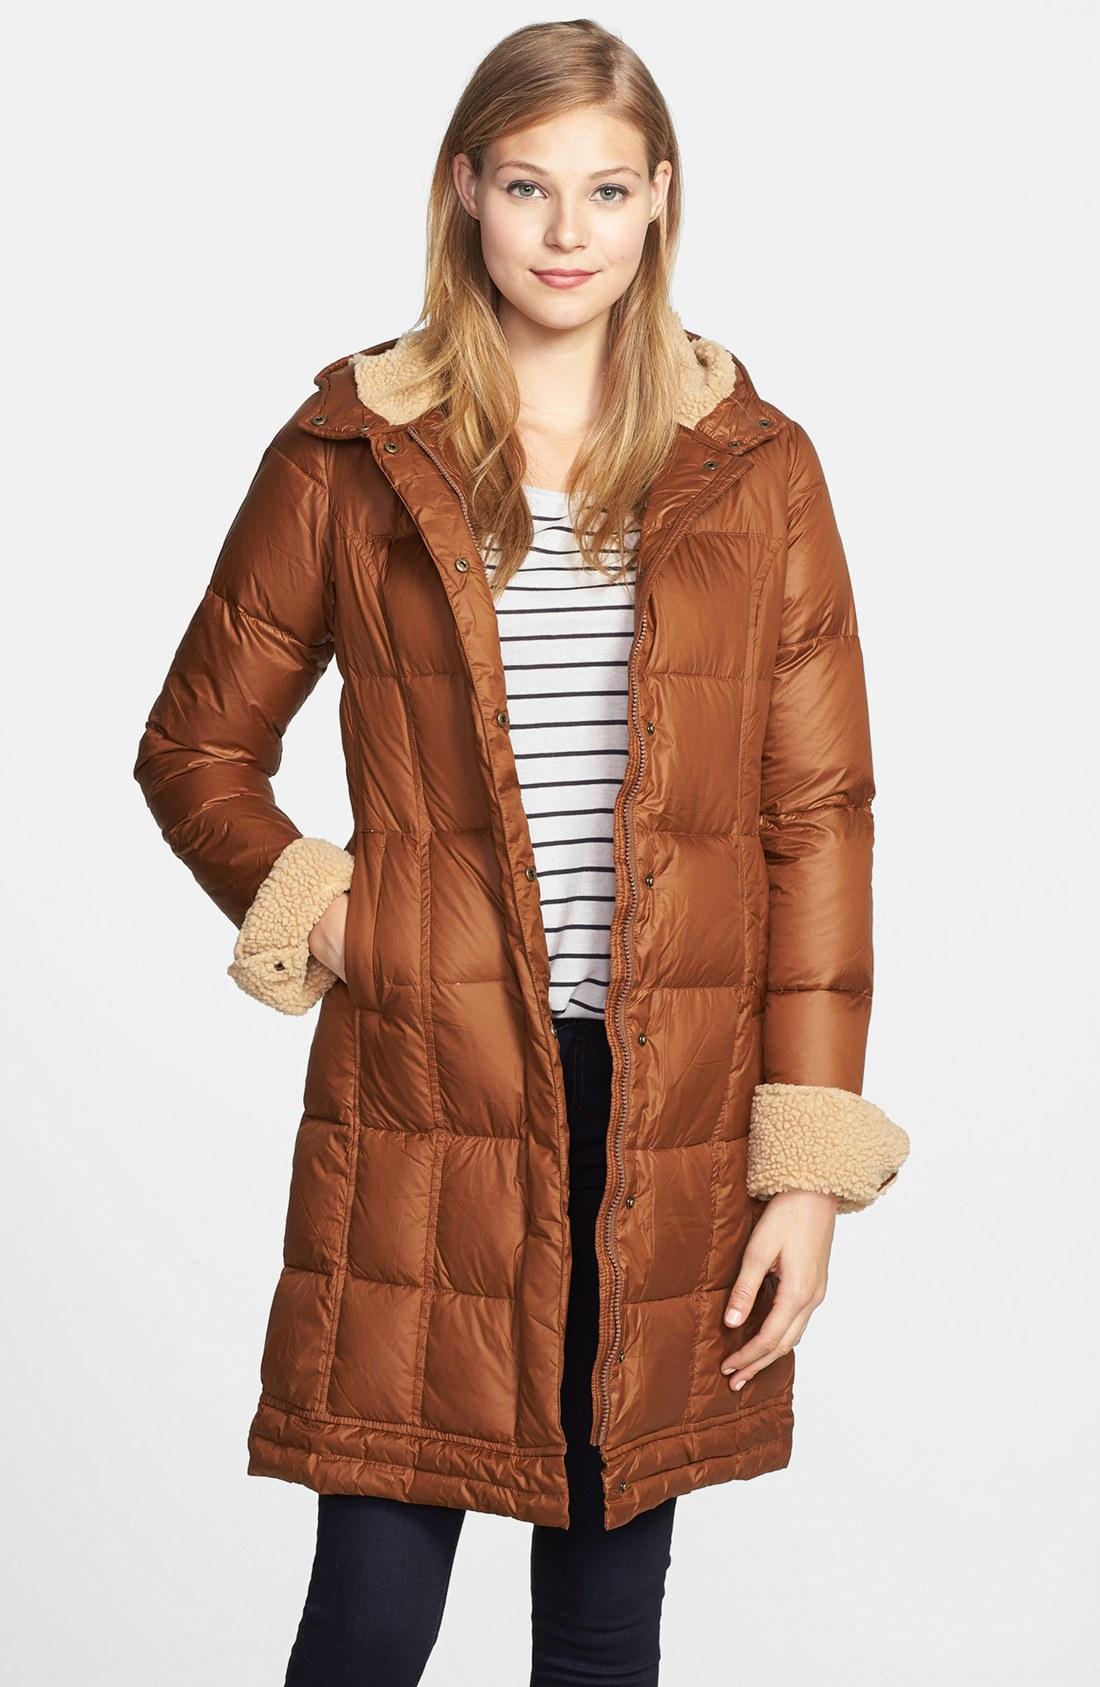 ugg down jacket women's